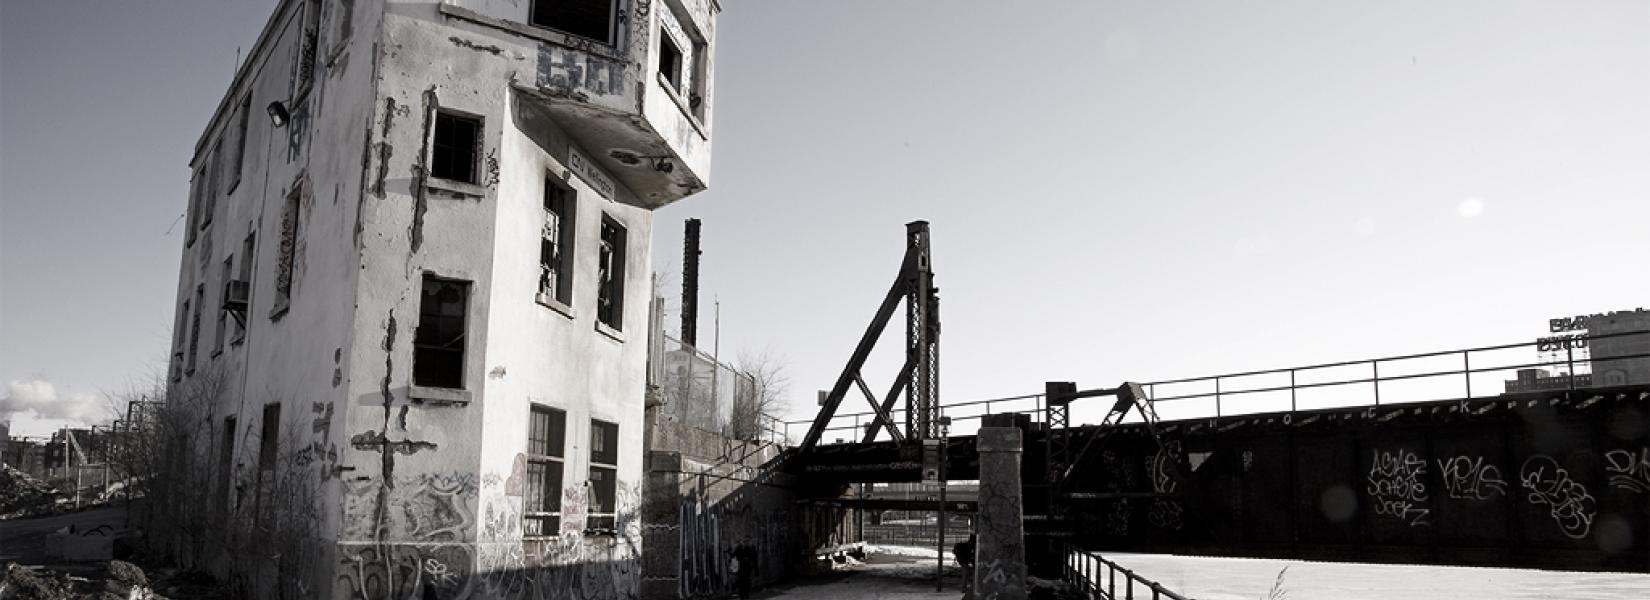 The Wellington tower